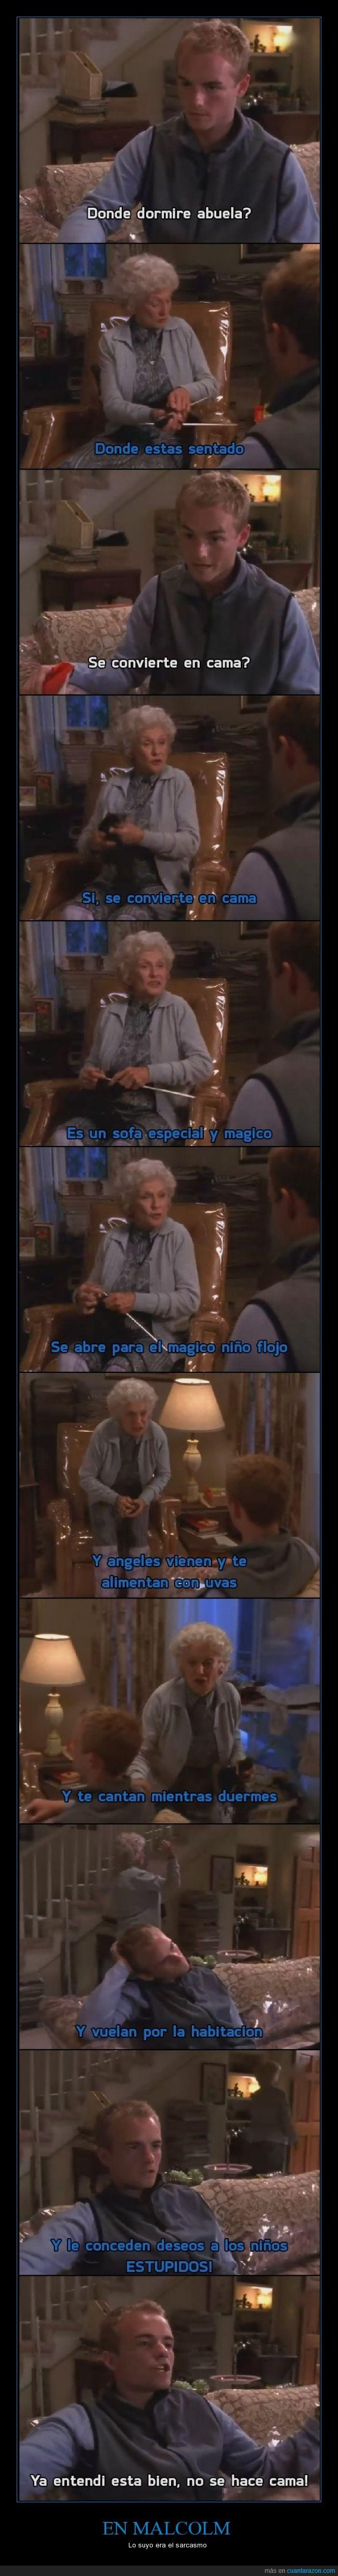 abuela,cama,Francis,magico,Malcolm in the middle,sarcasmo,sofa,troll